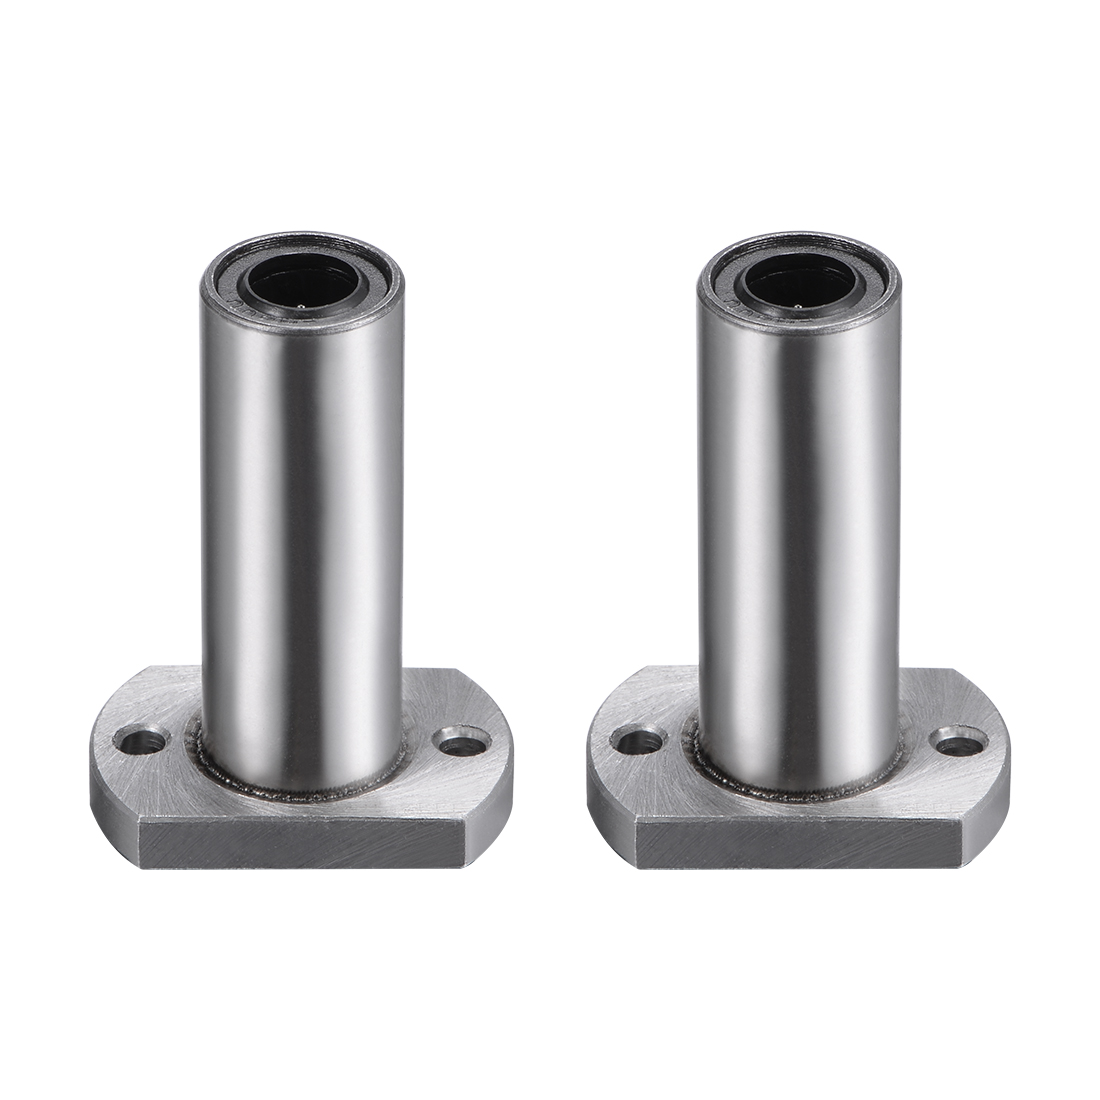 8mm Linear Ball Bearings Two Side Cut Flange LMH8LUU, 8mm Bore, 45mm Length 2pcs